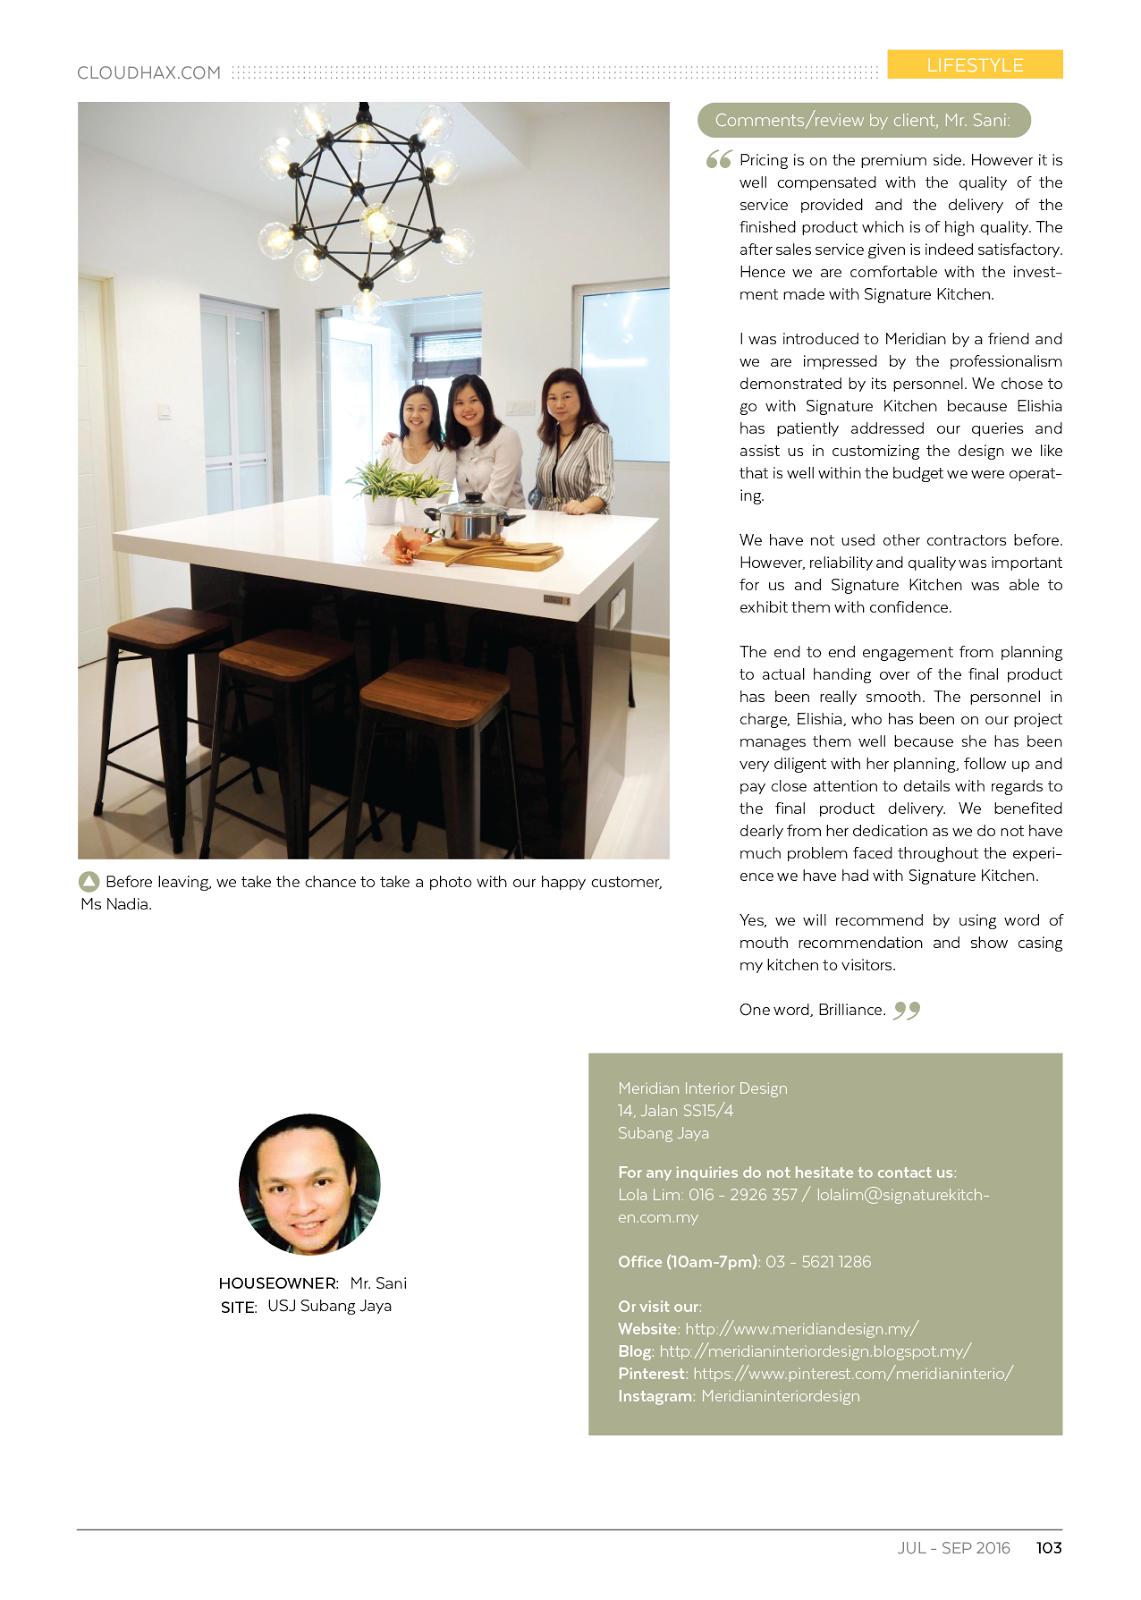 Meridian Interior Design And Kitchen Design In Kuala Lumpur Selangor Malaysia Modern